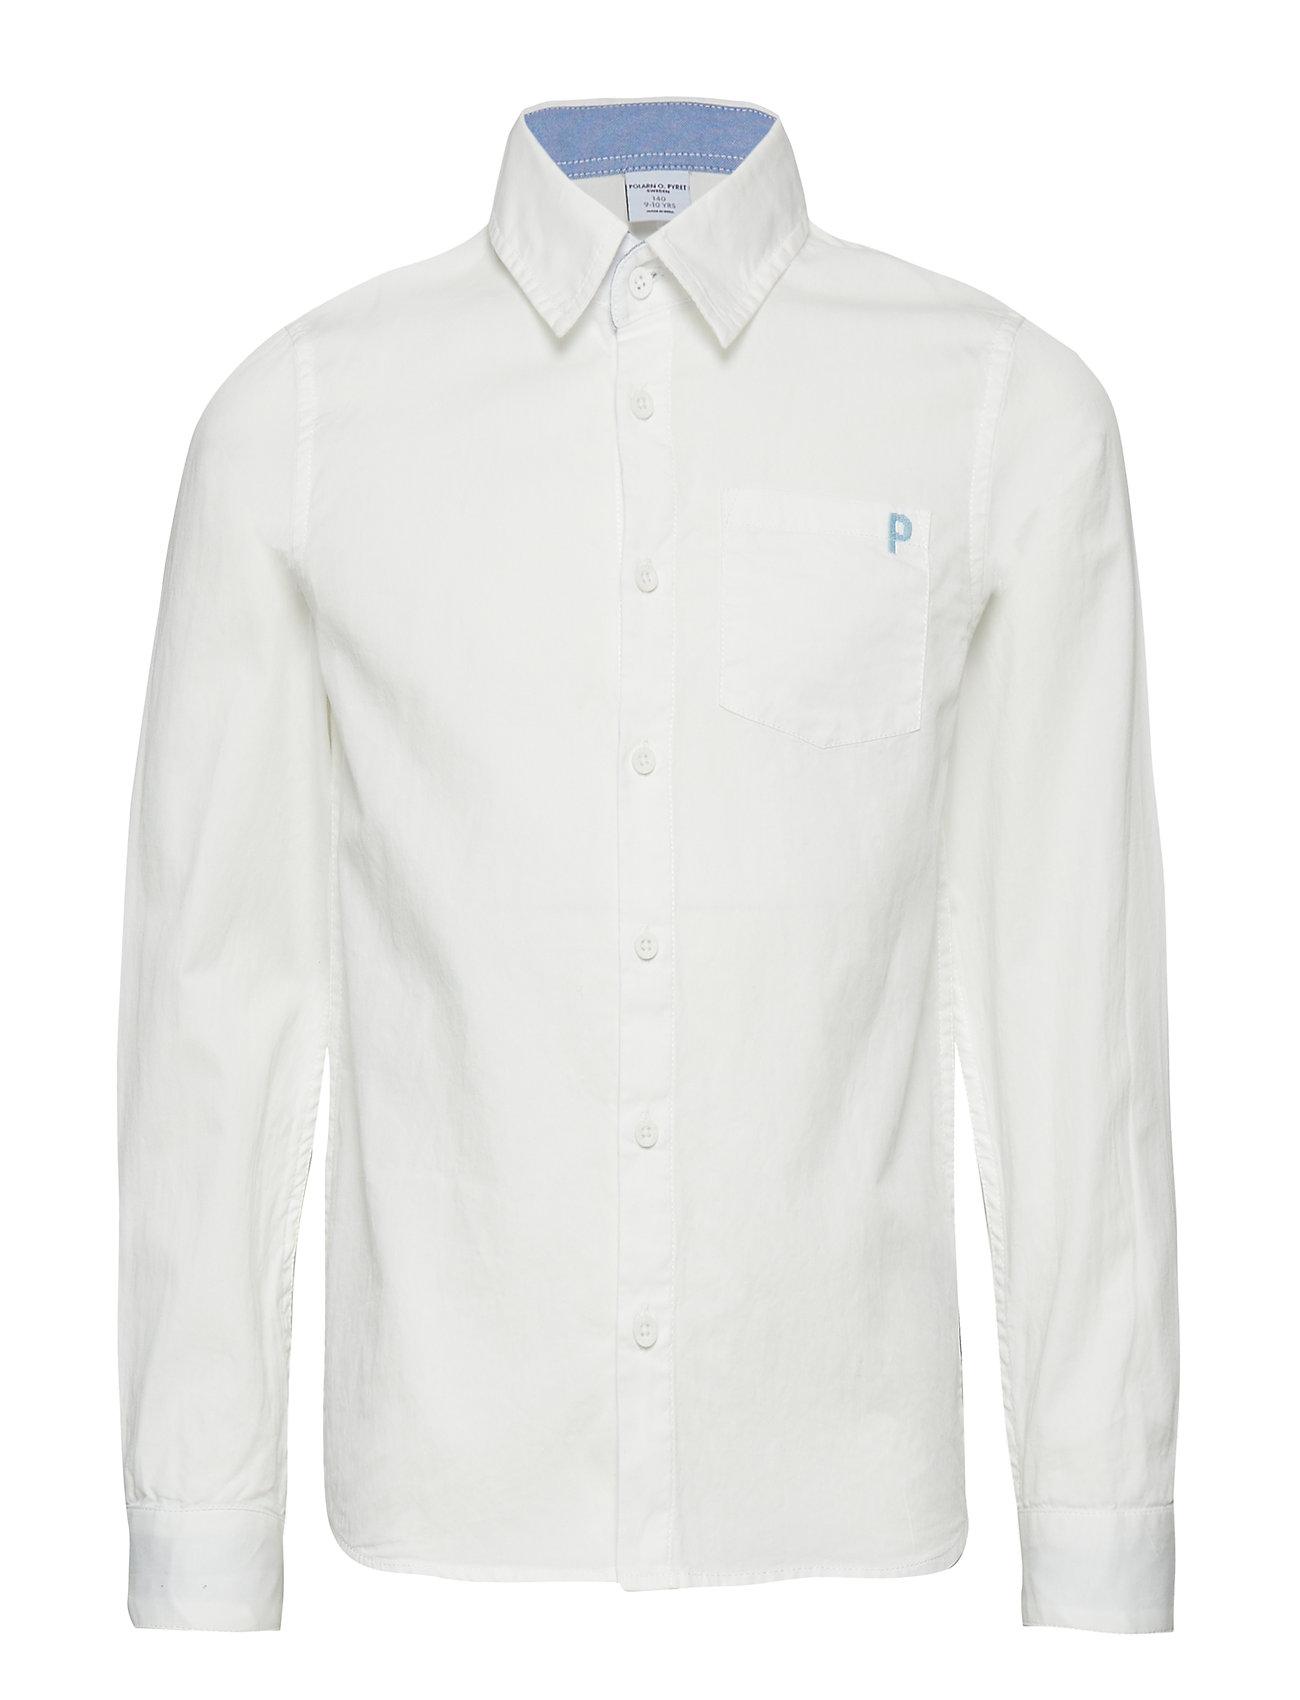 Polarn O. Pyret Shirt l/s W Embroidery School